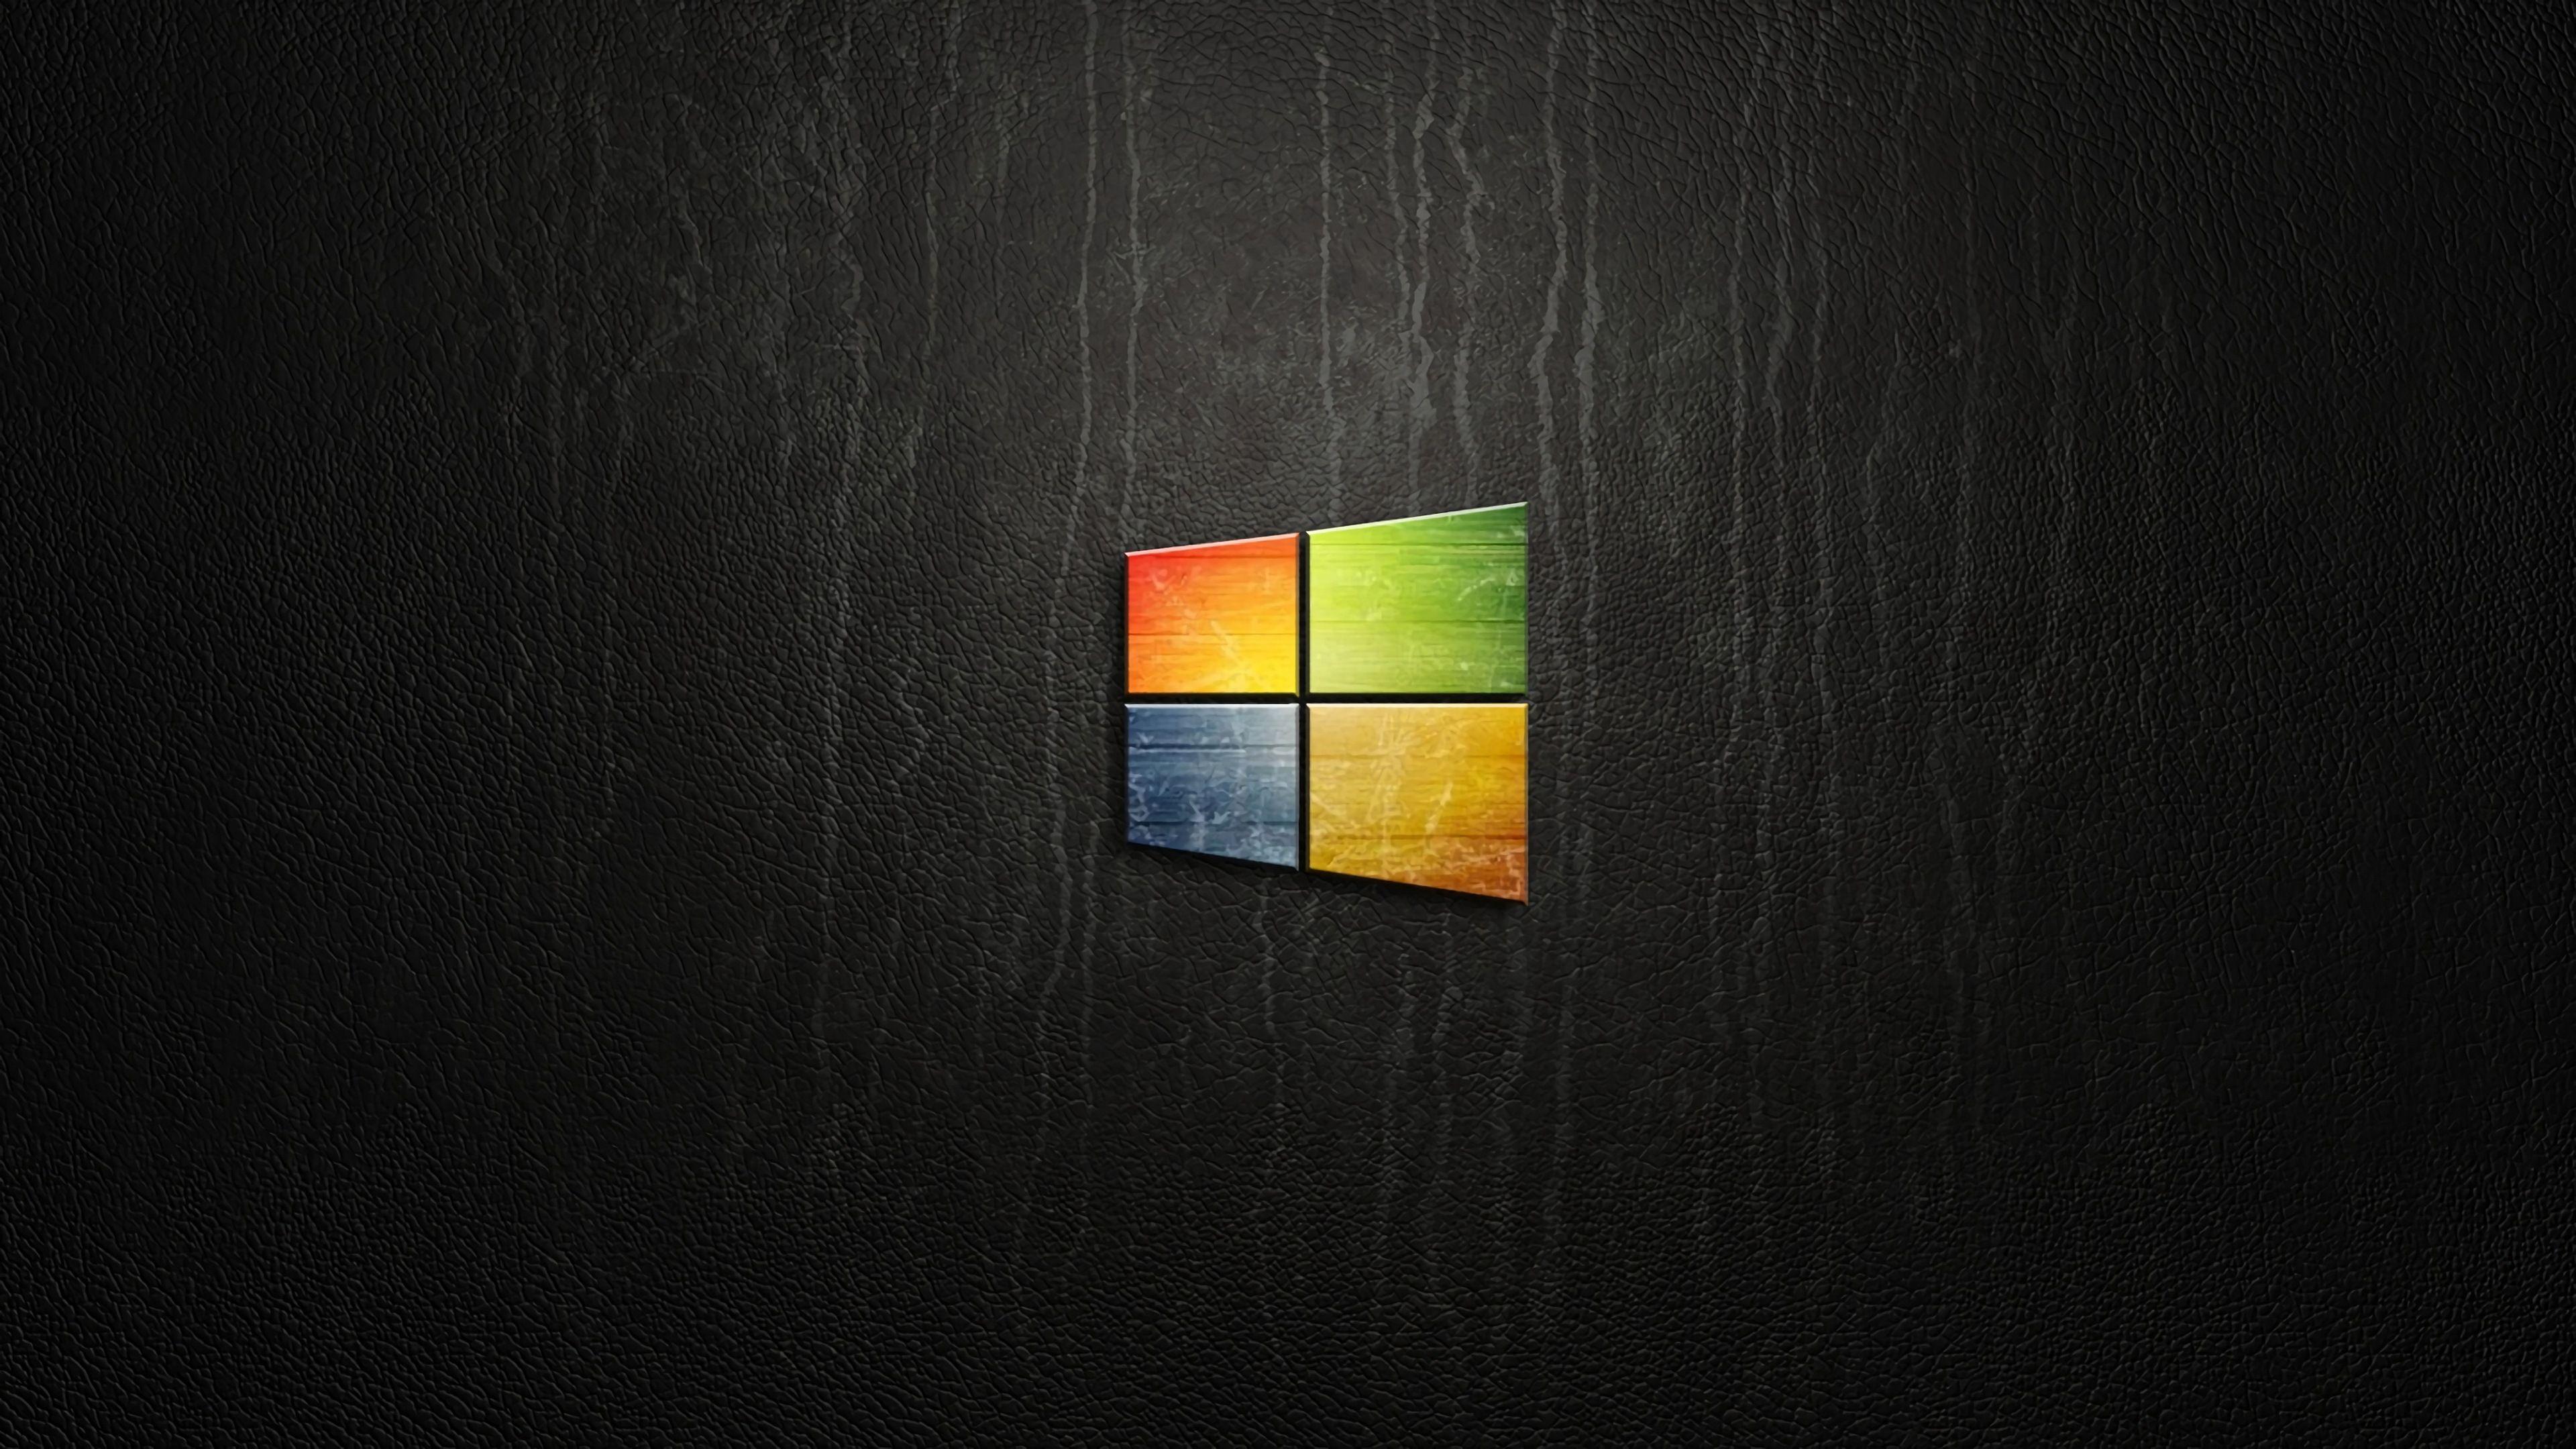 Wallpaper Windows K K Wallpaper Microsoft Blue Sea Hd